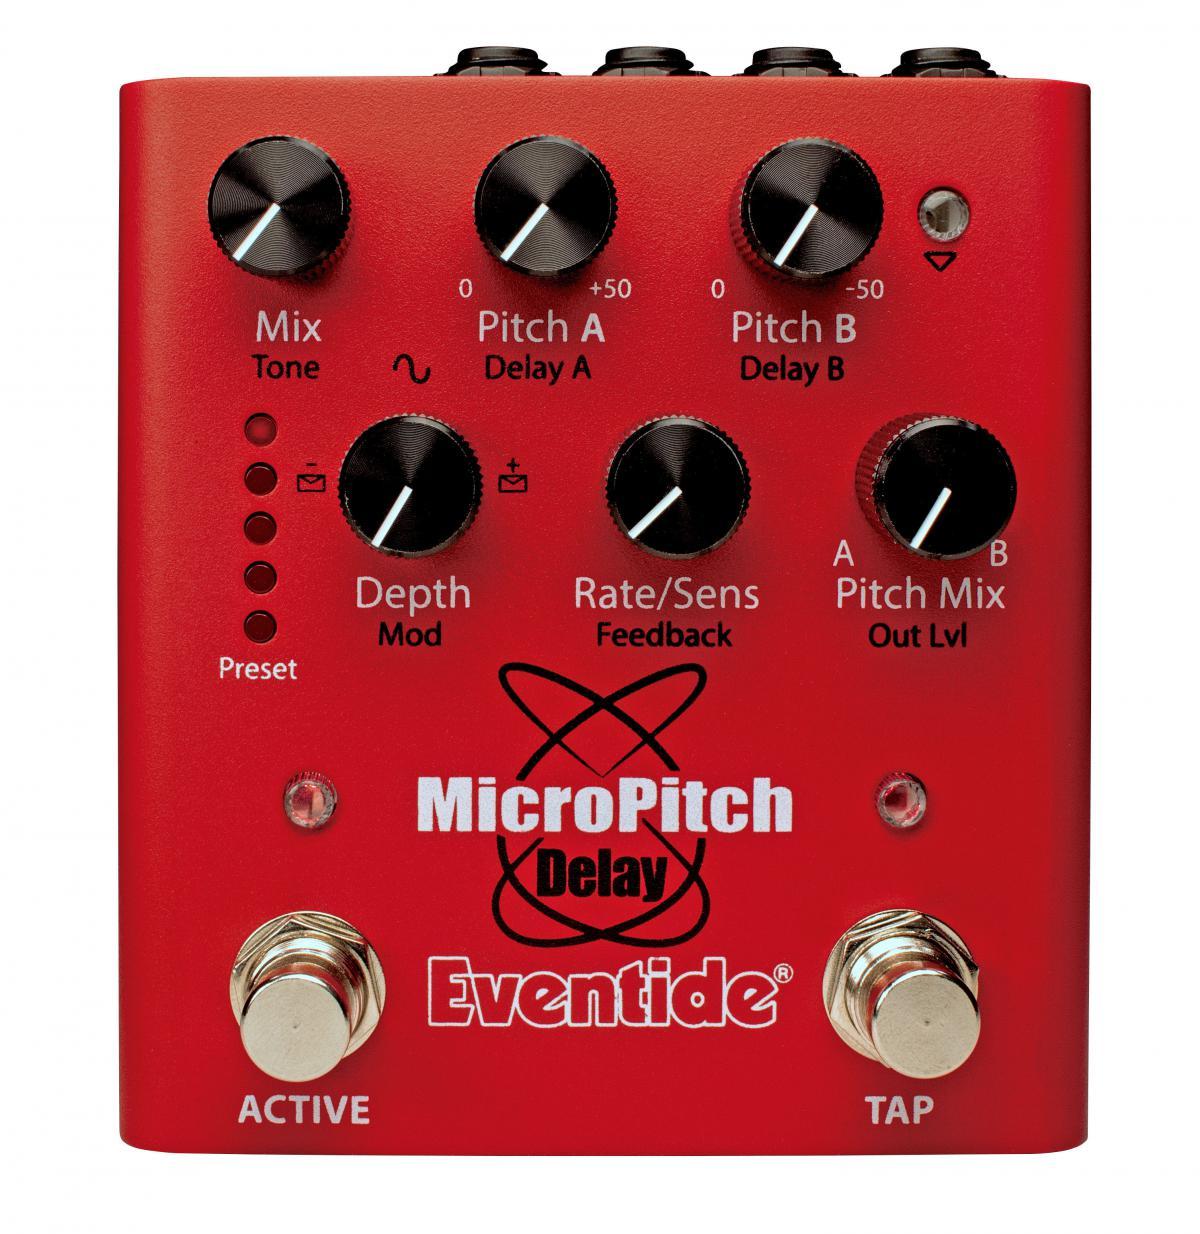 Eventide Audio Micropitch Delay